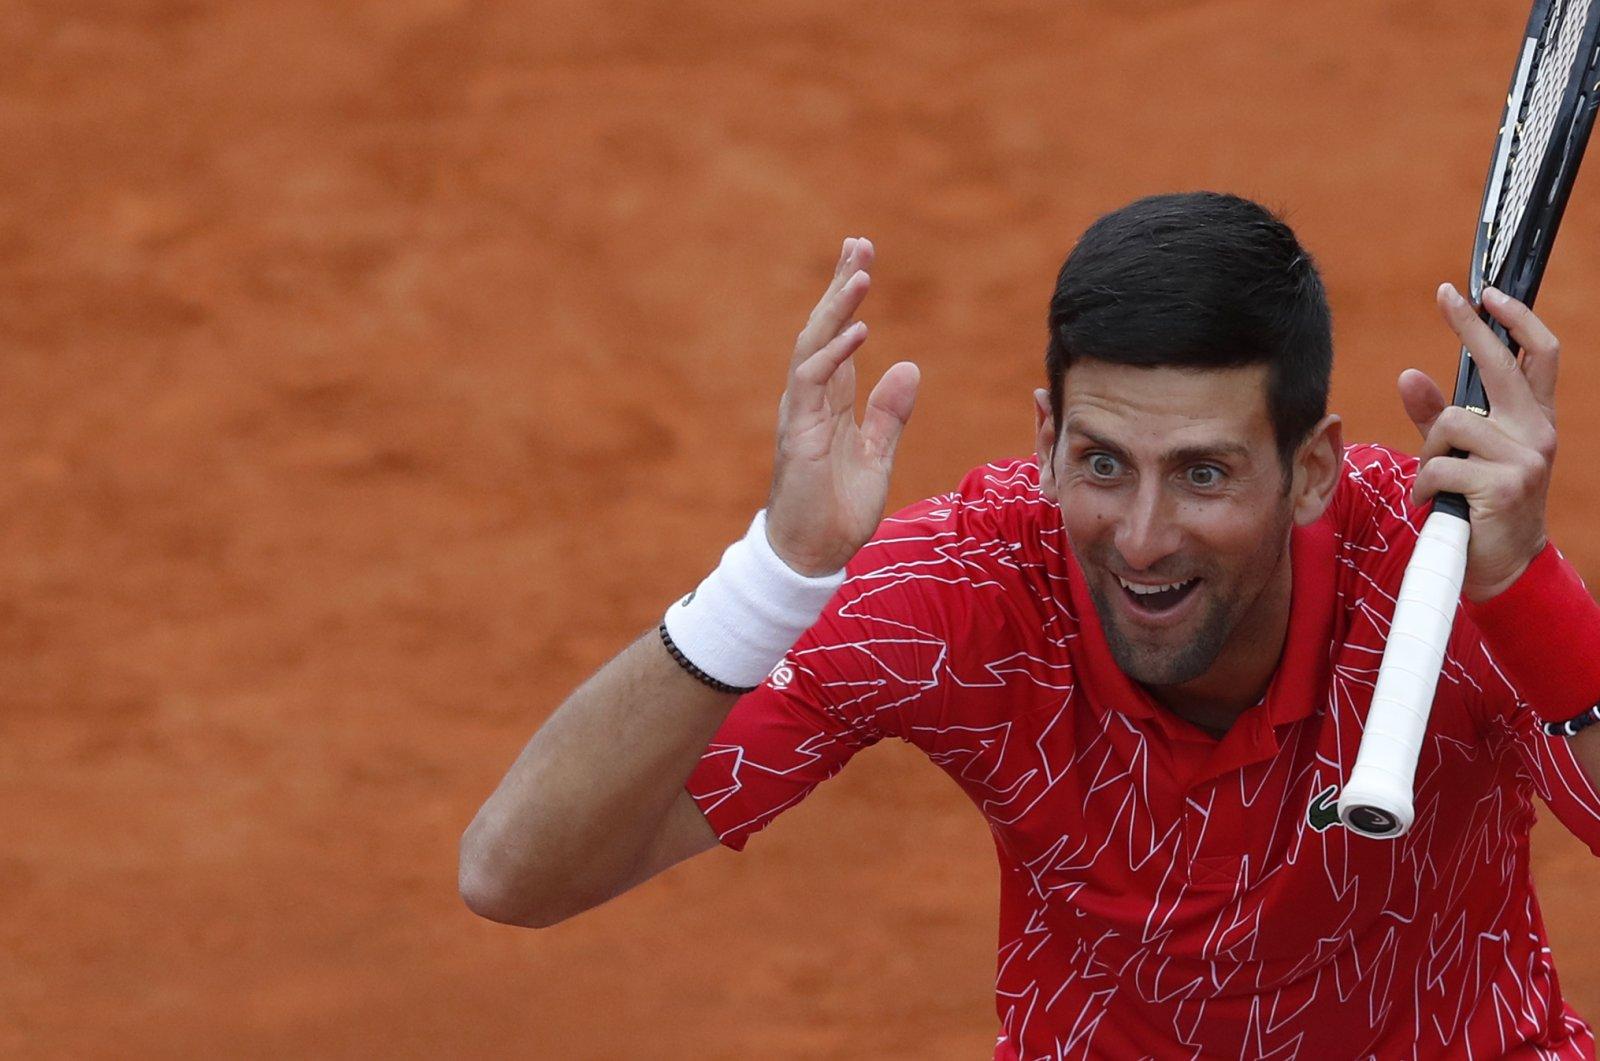 Novak Djokovic reacts during a tennis doubles match at a charity tournament Adria Tour, Belgrade, Serbia, June 12, 2020. (AP Photo)